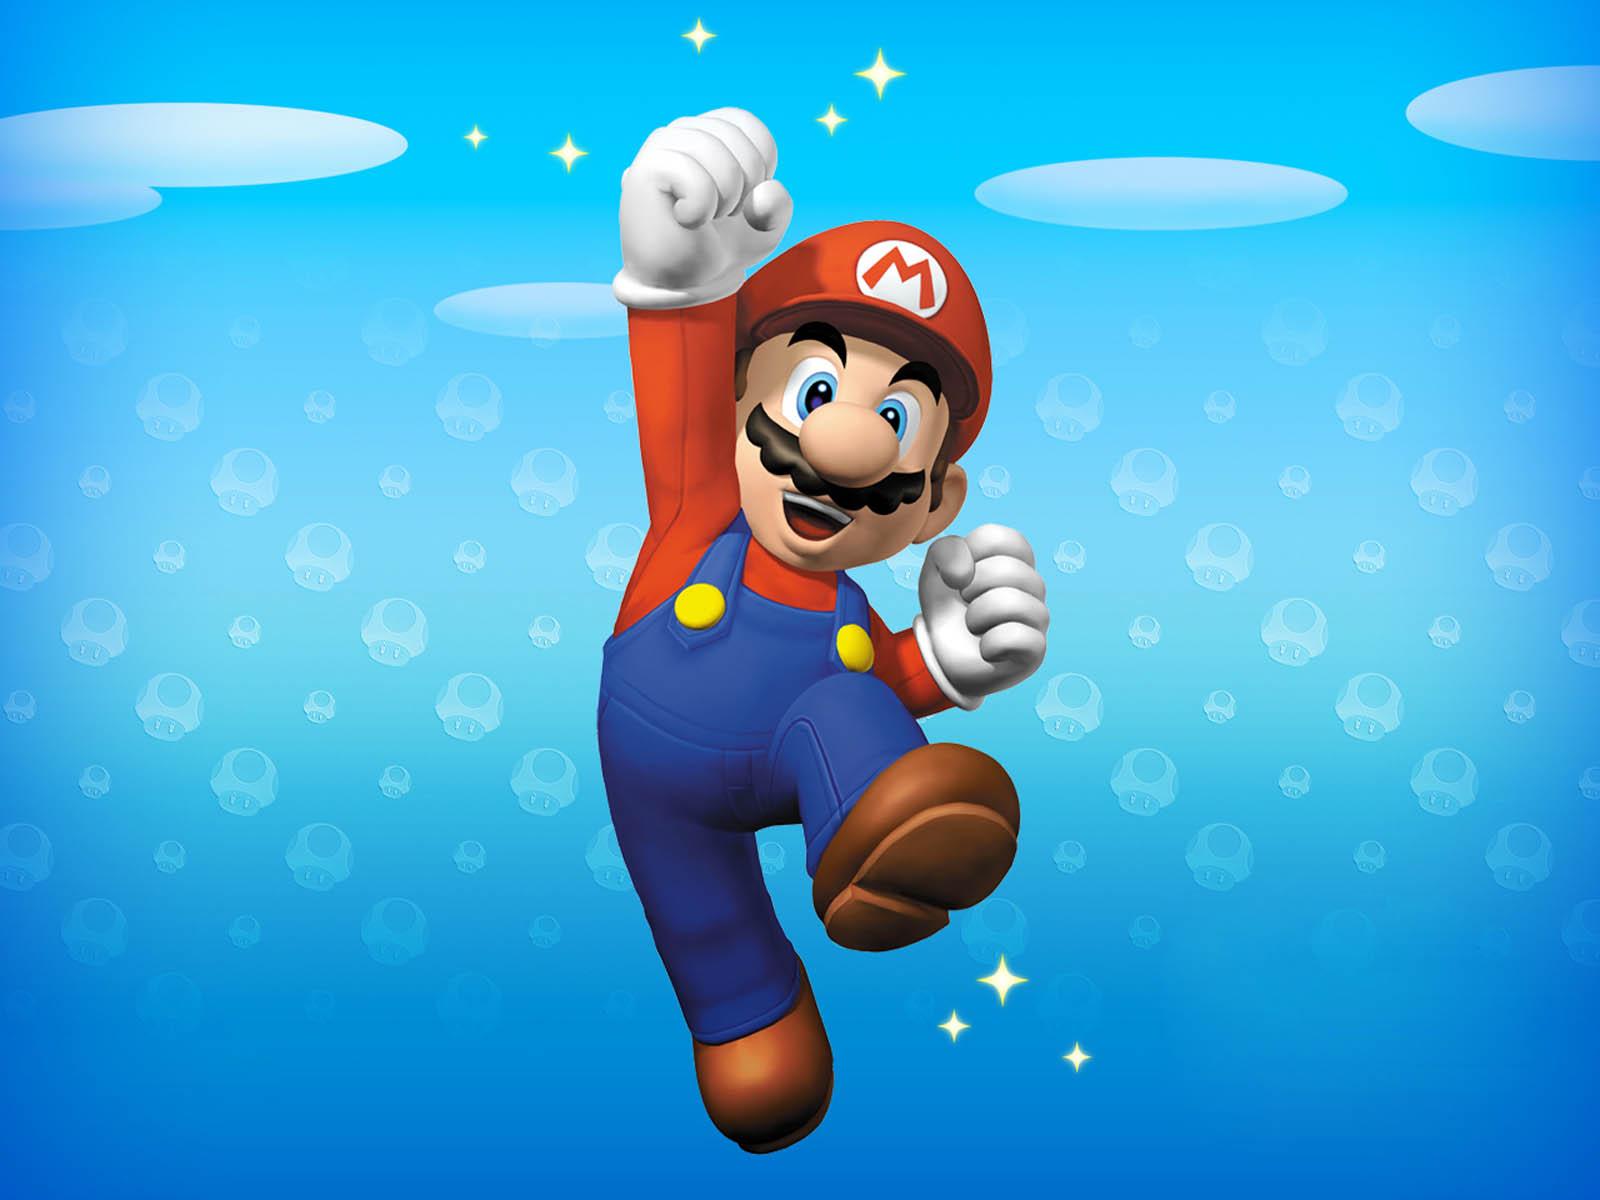 wallpapers: Super Mario Wallpapers